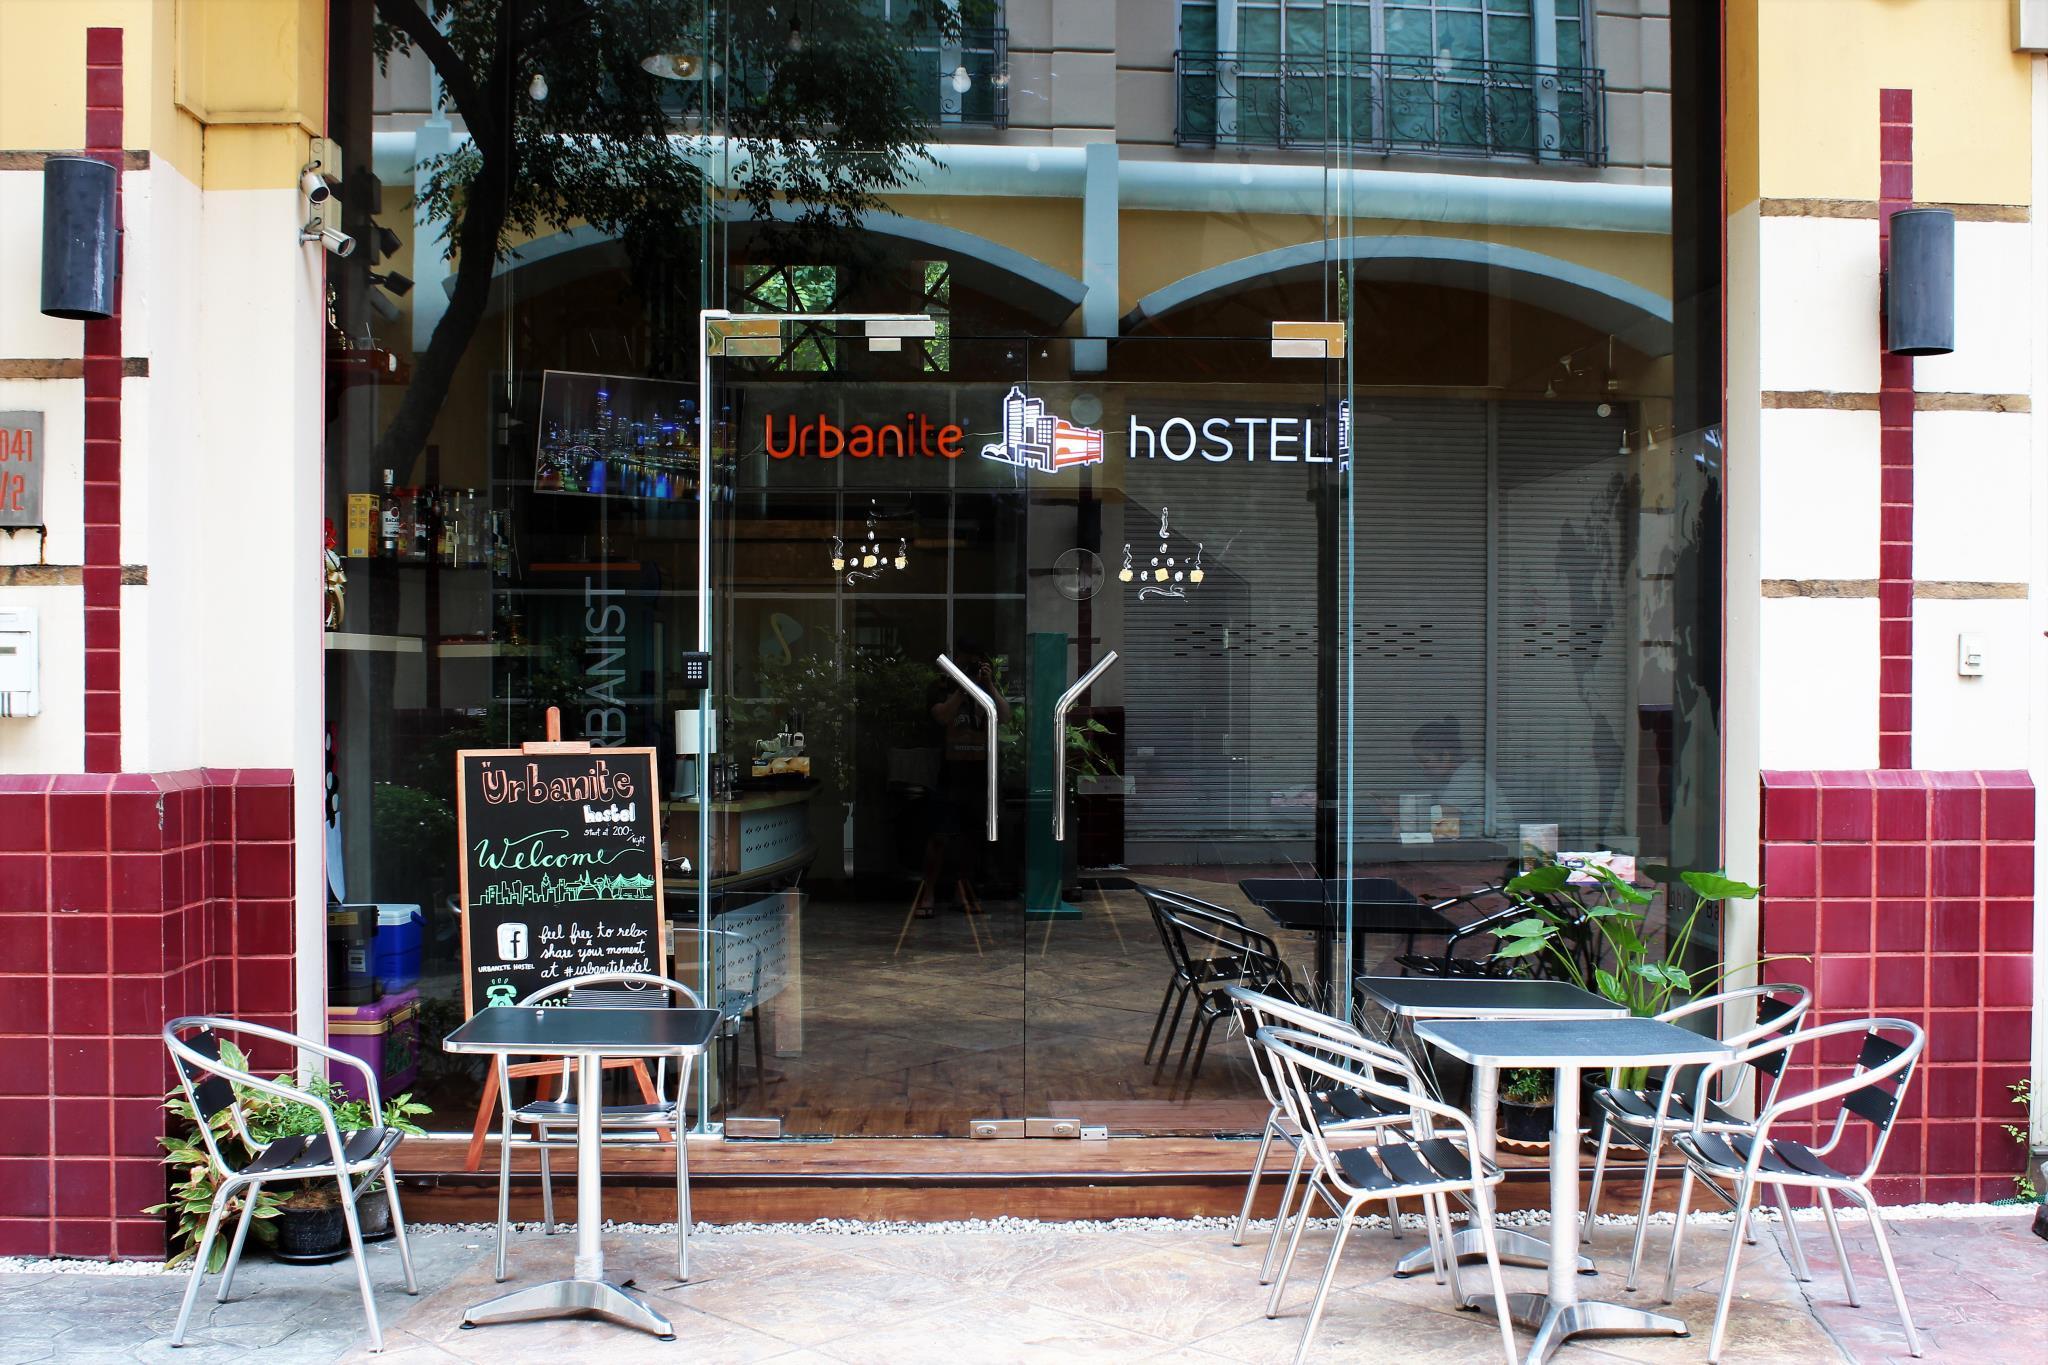 Urbanite Hostel.